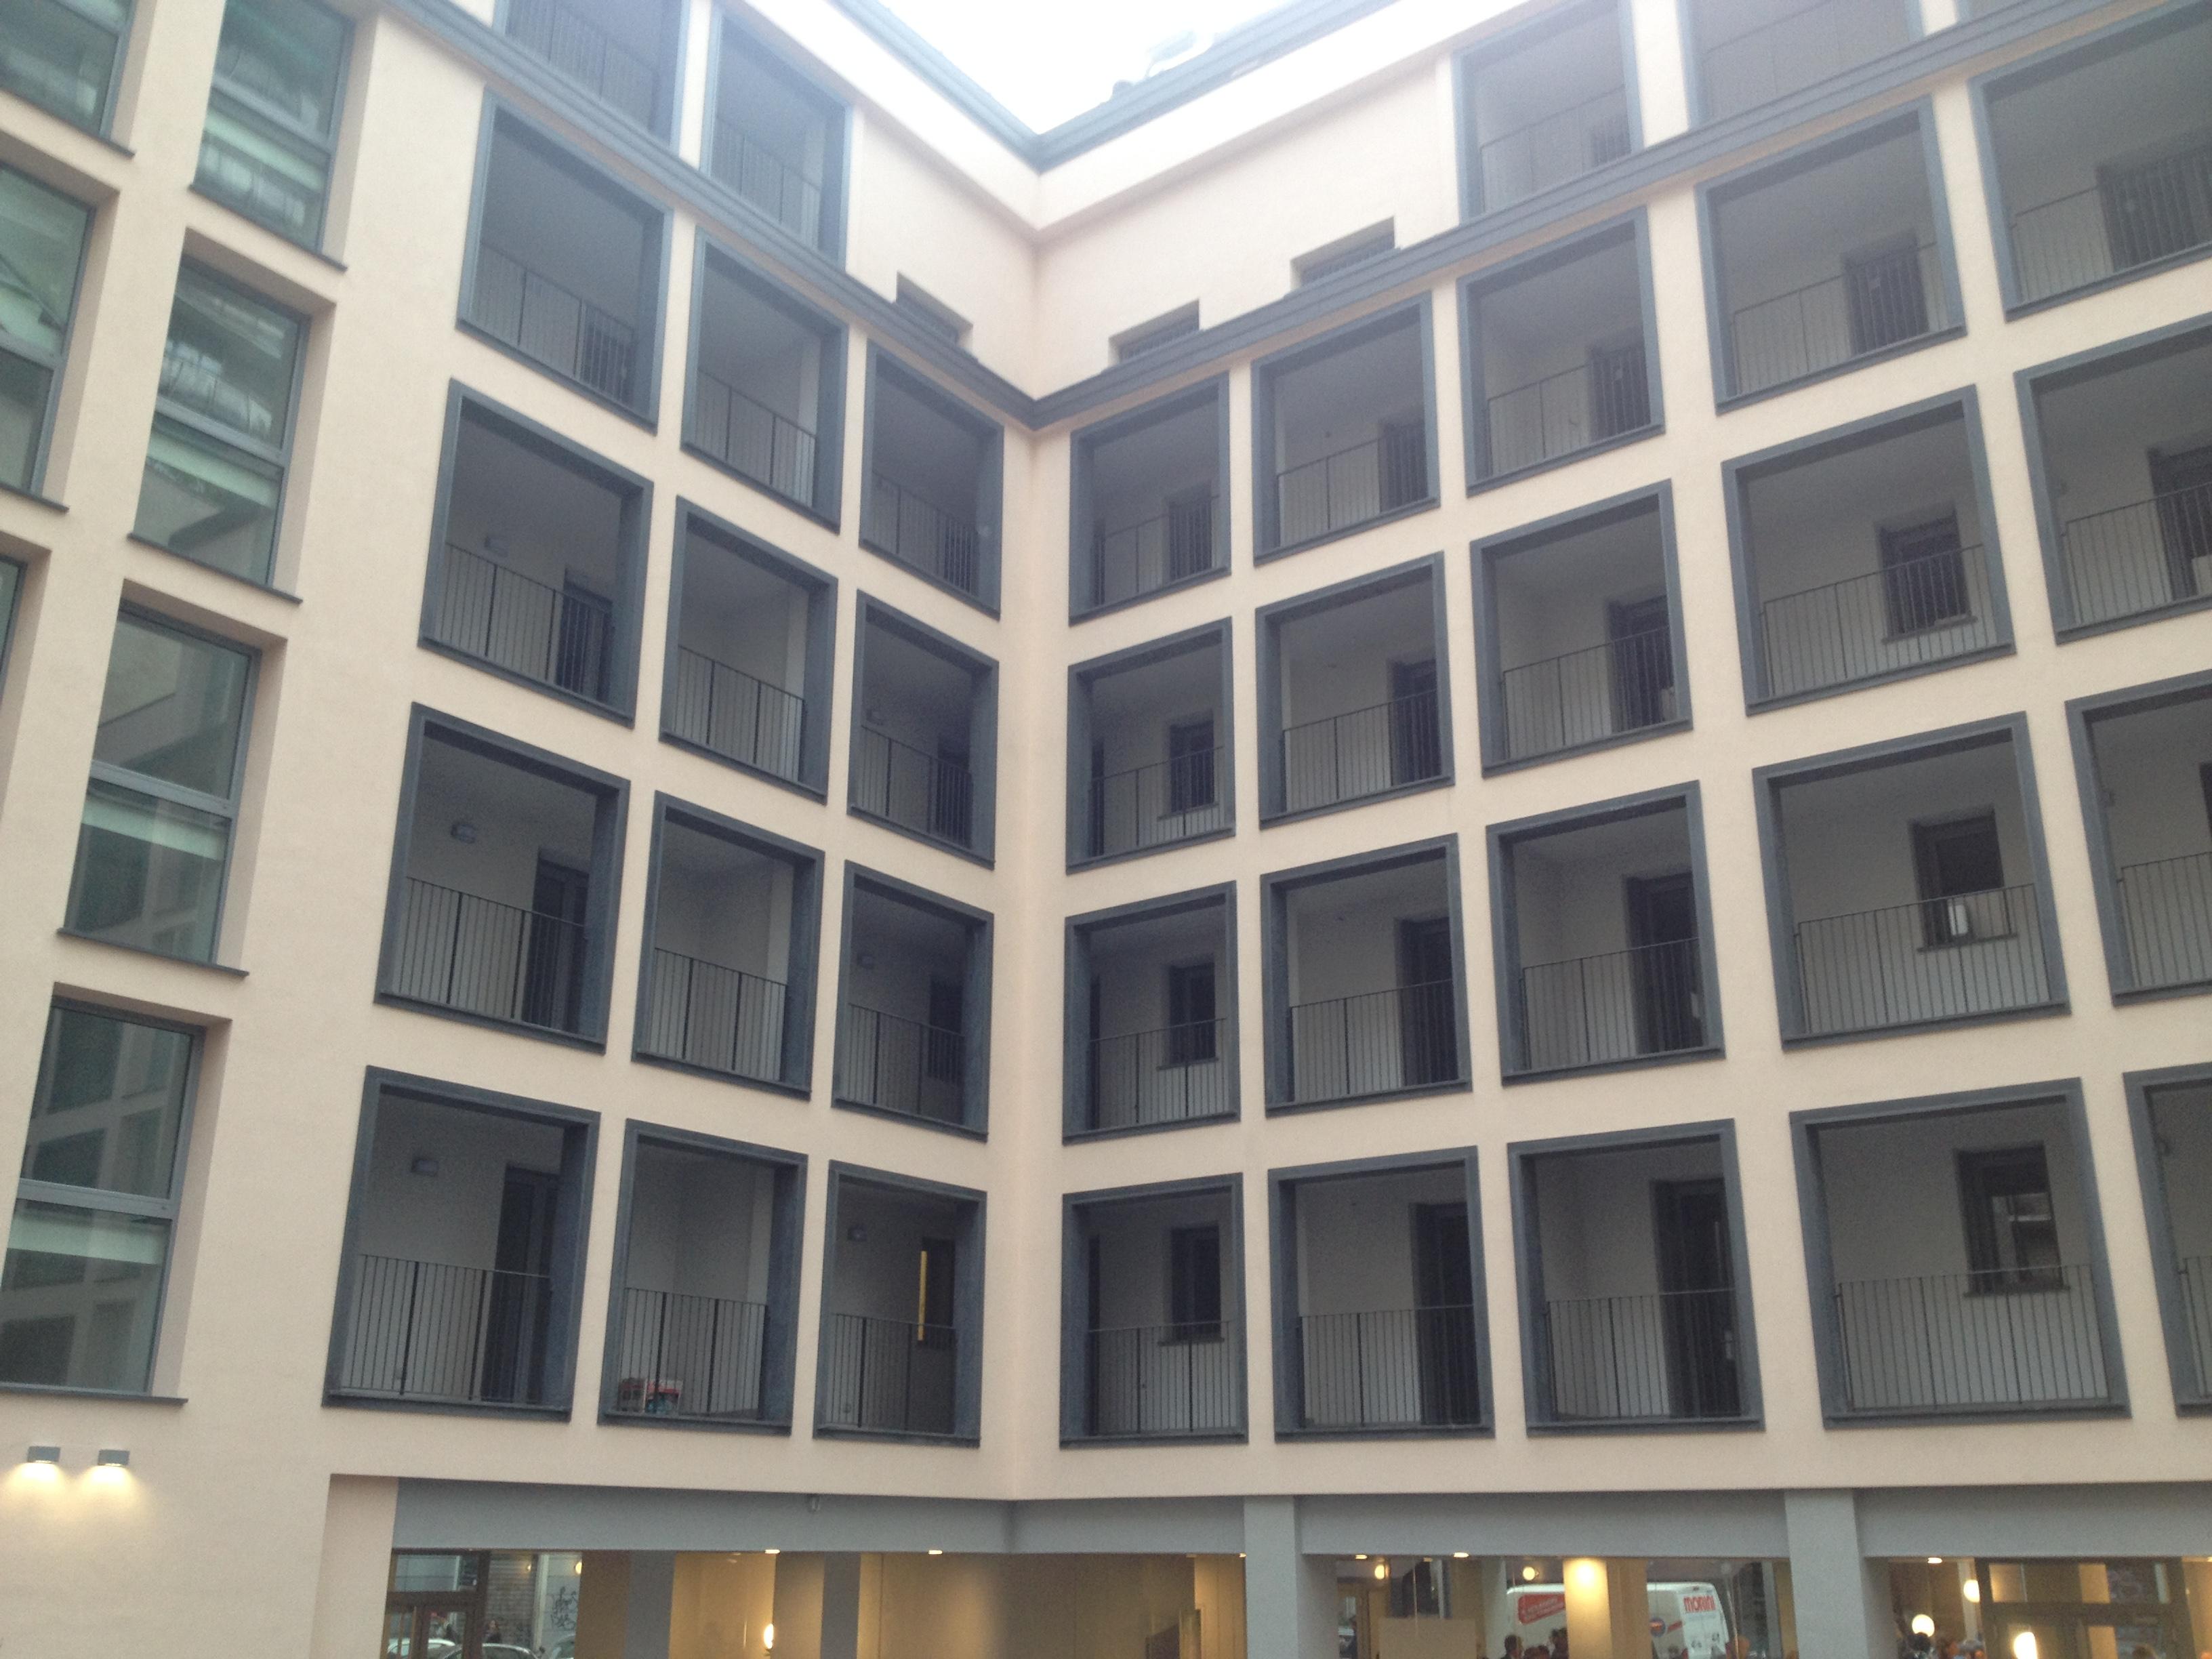 Edificio residenziale – via Gustavo Fara 18 – Milano